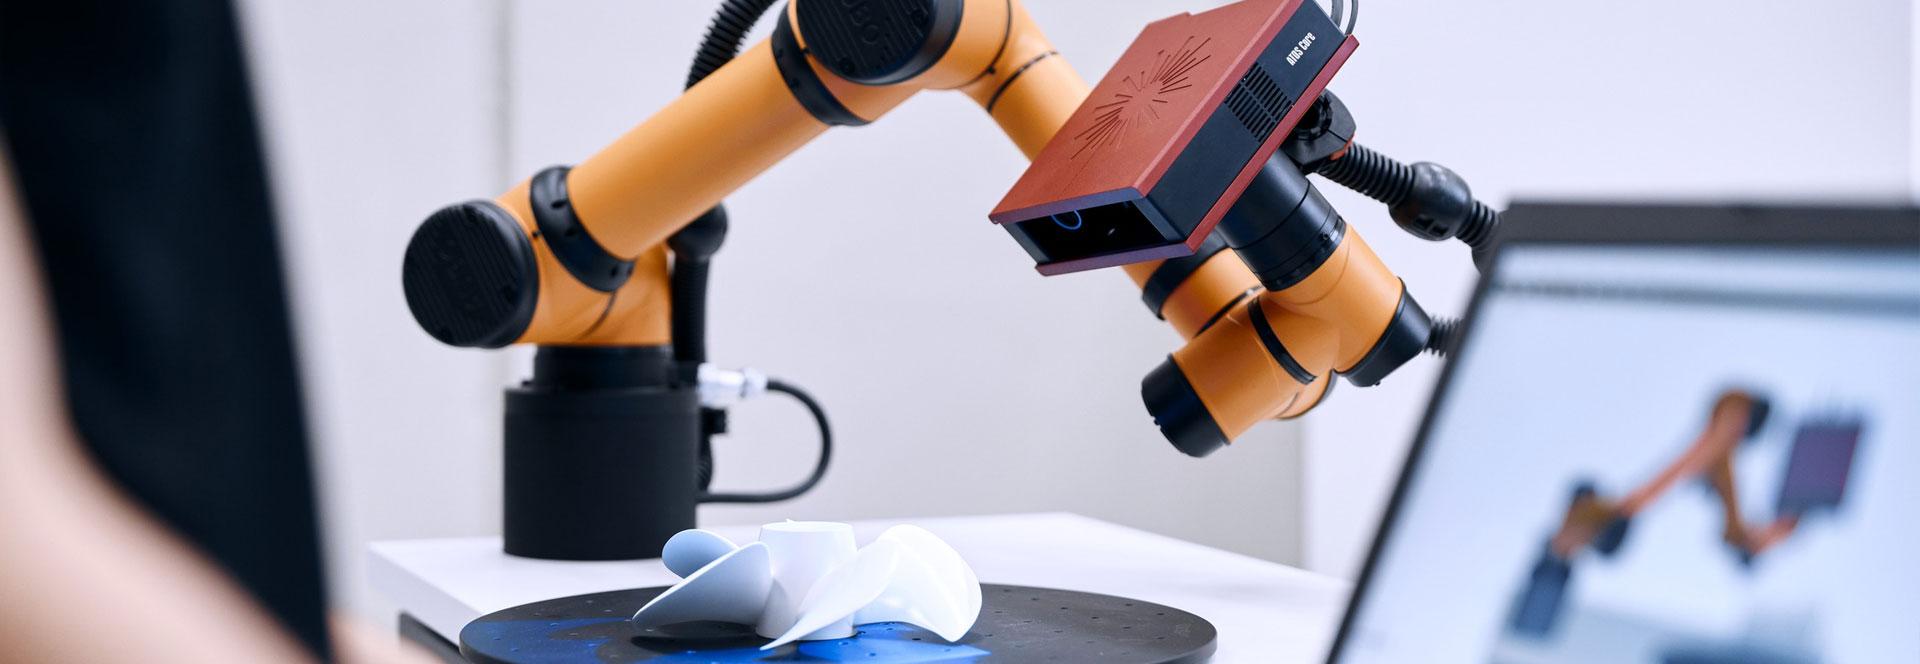 automation-gom-scancobot-2